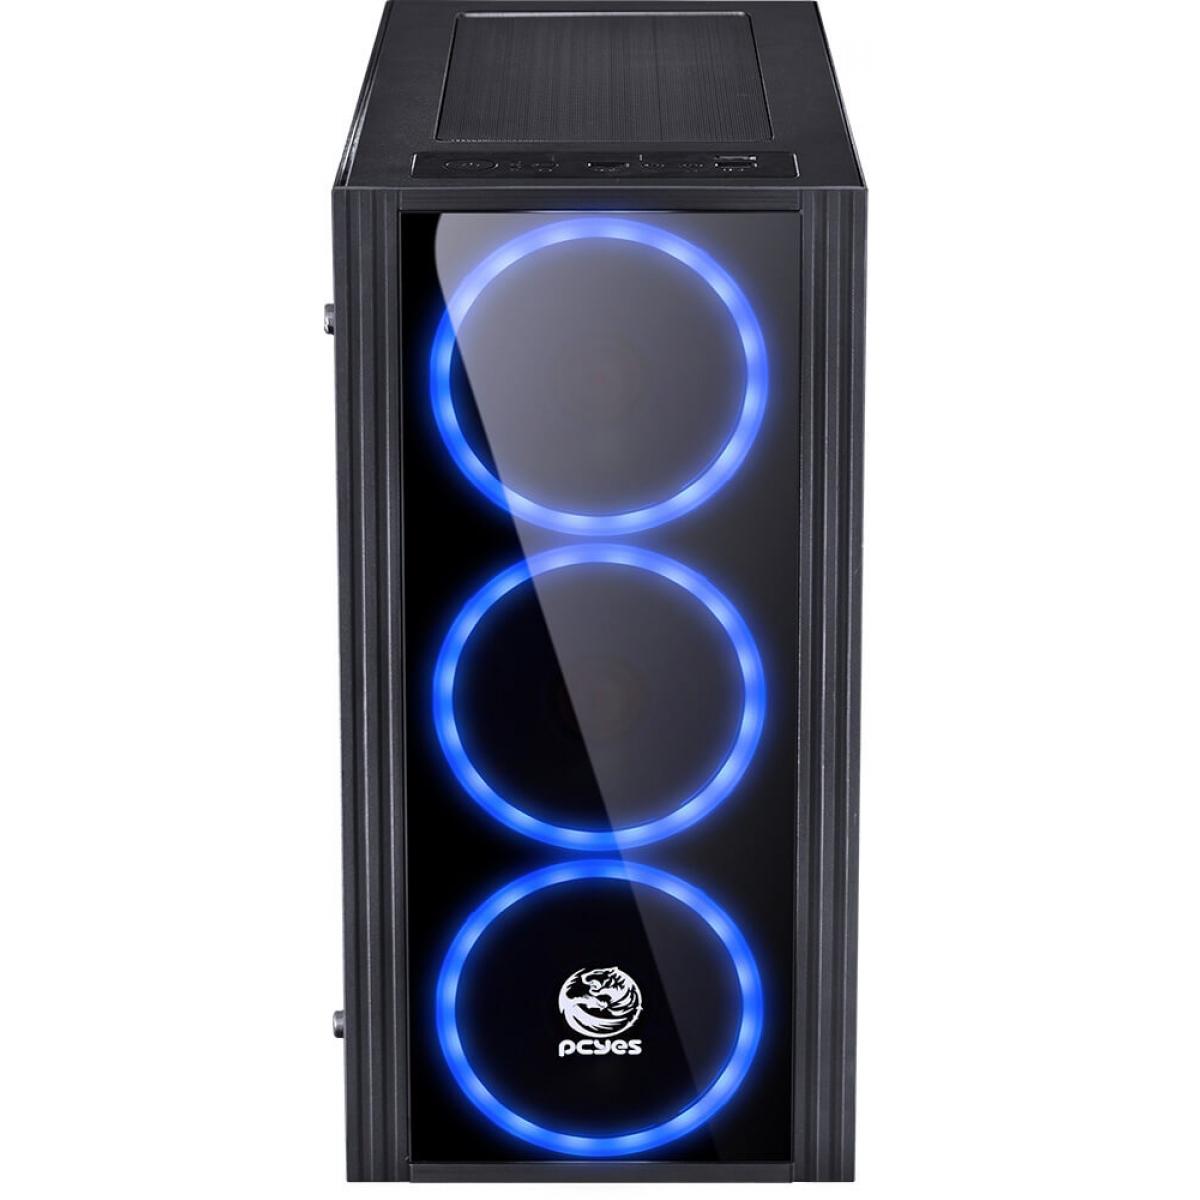 Gabinete Gamer PCyes Saturn, Mid Tower, Com 3 Fans Blue, Lateral de Acrílico, Black, Sem Fonte, SATPTAZ3FCA